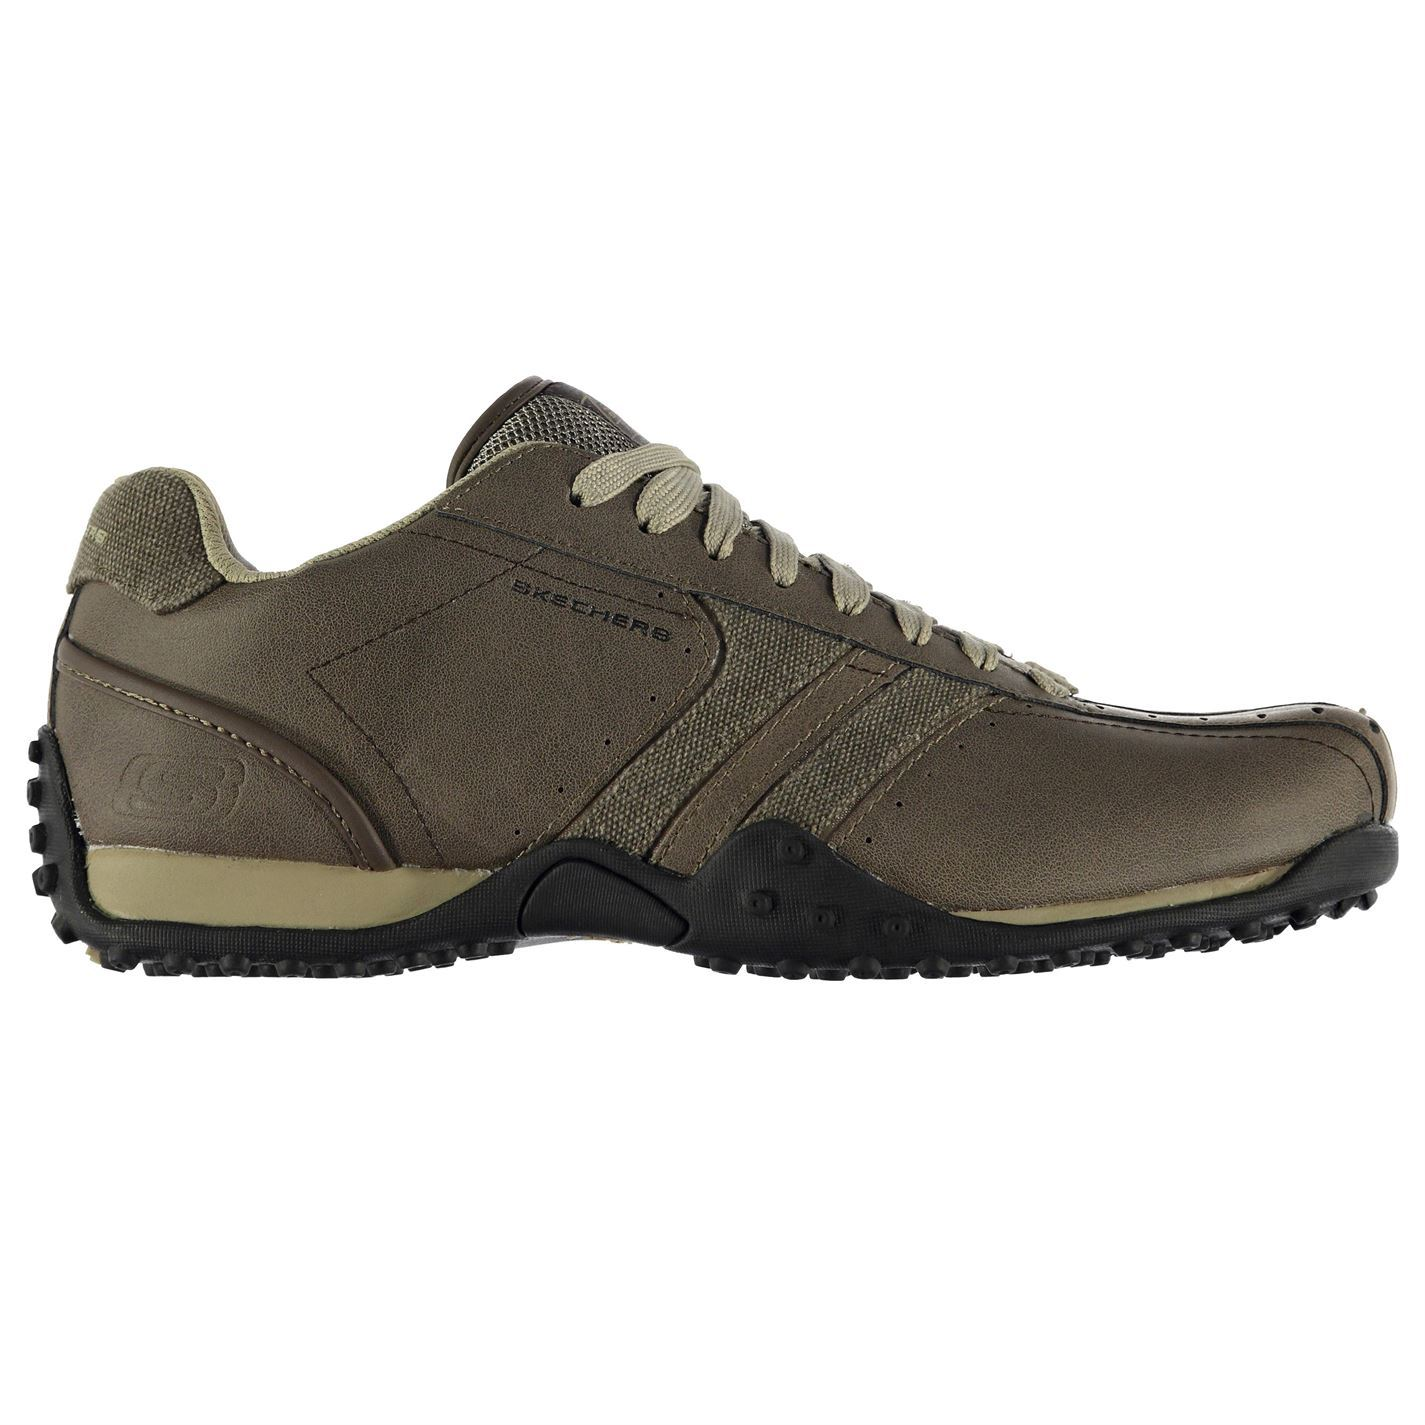 Skechers-Urban-Track-Forward-Trainers-Mens-Athleisure-Footwear-Shoes-Sneakers thumbnail 15